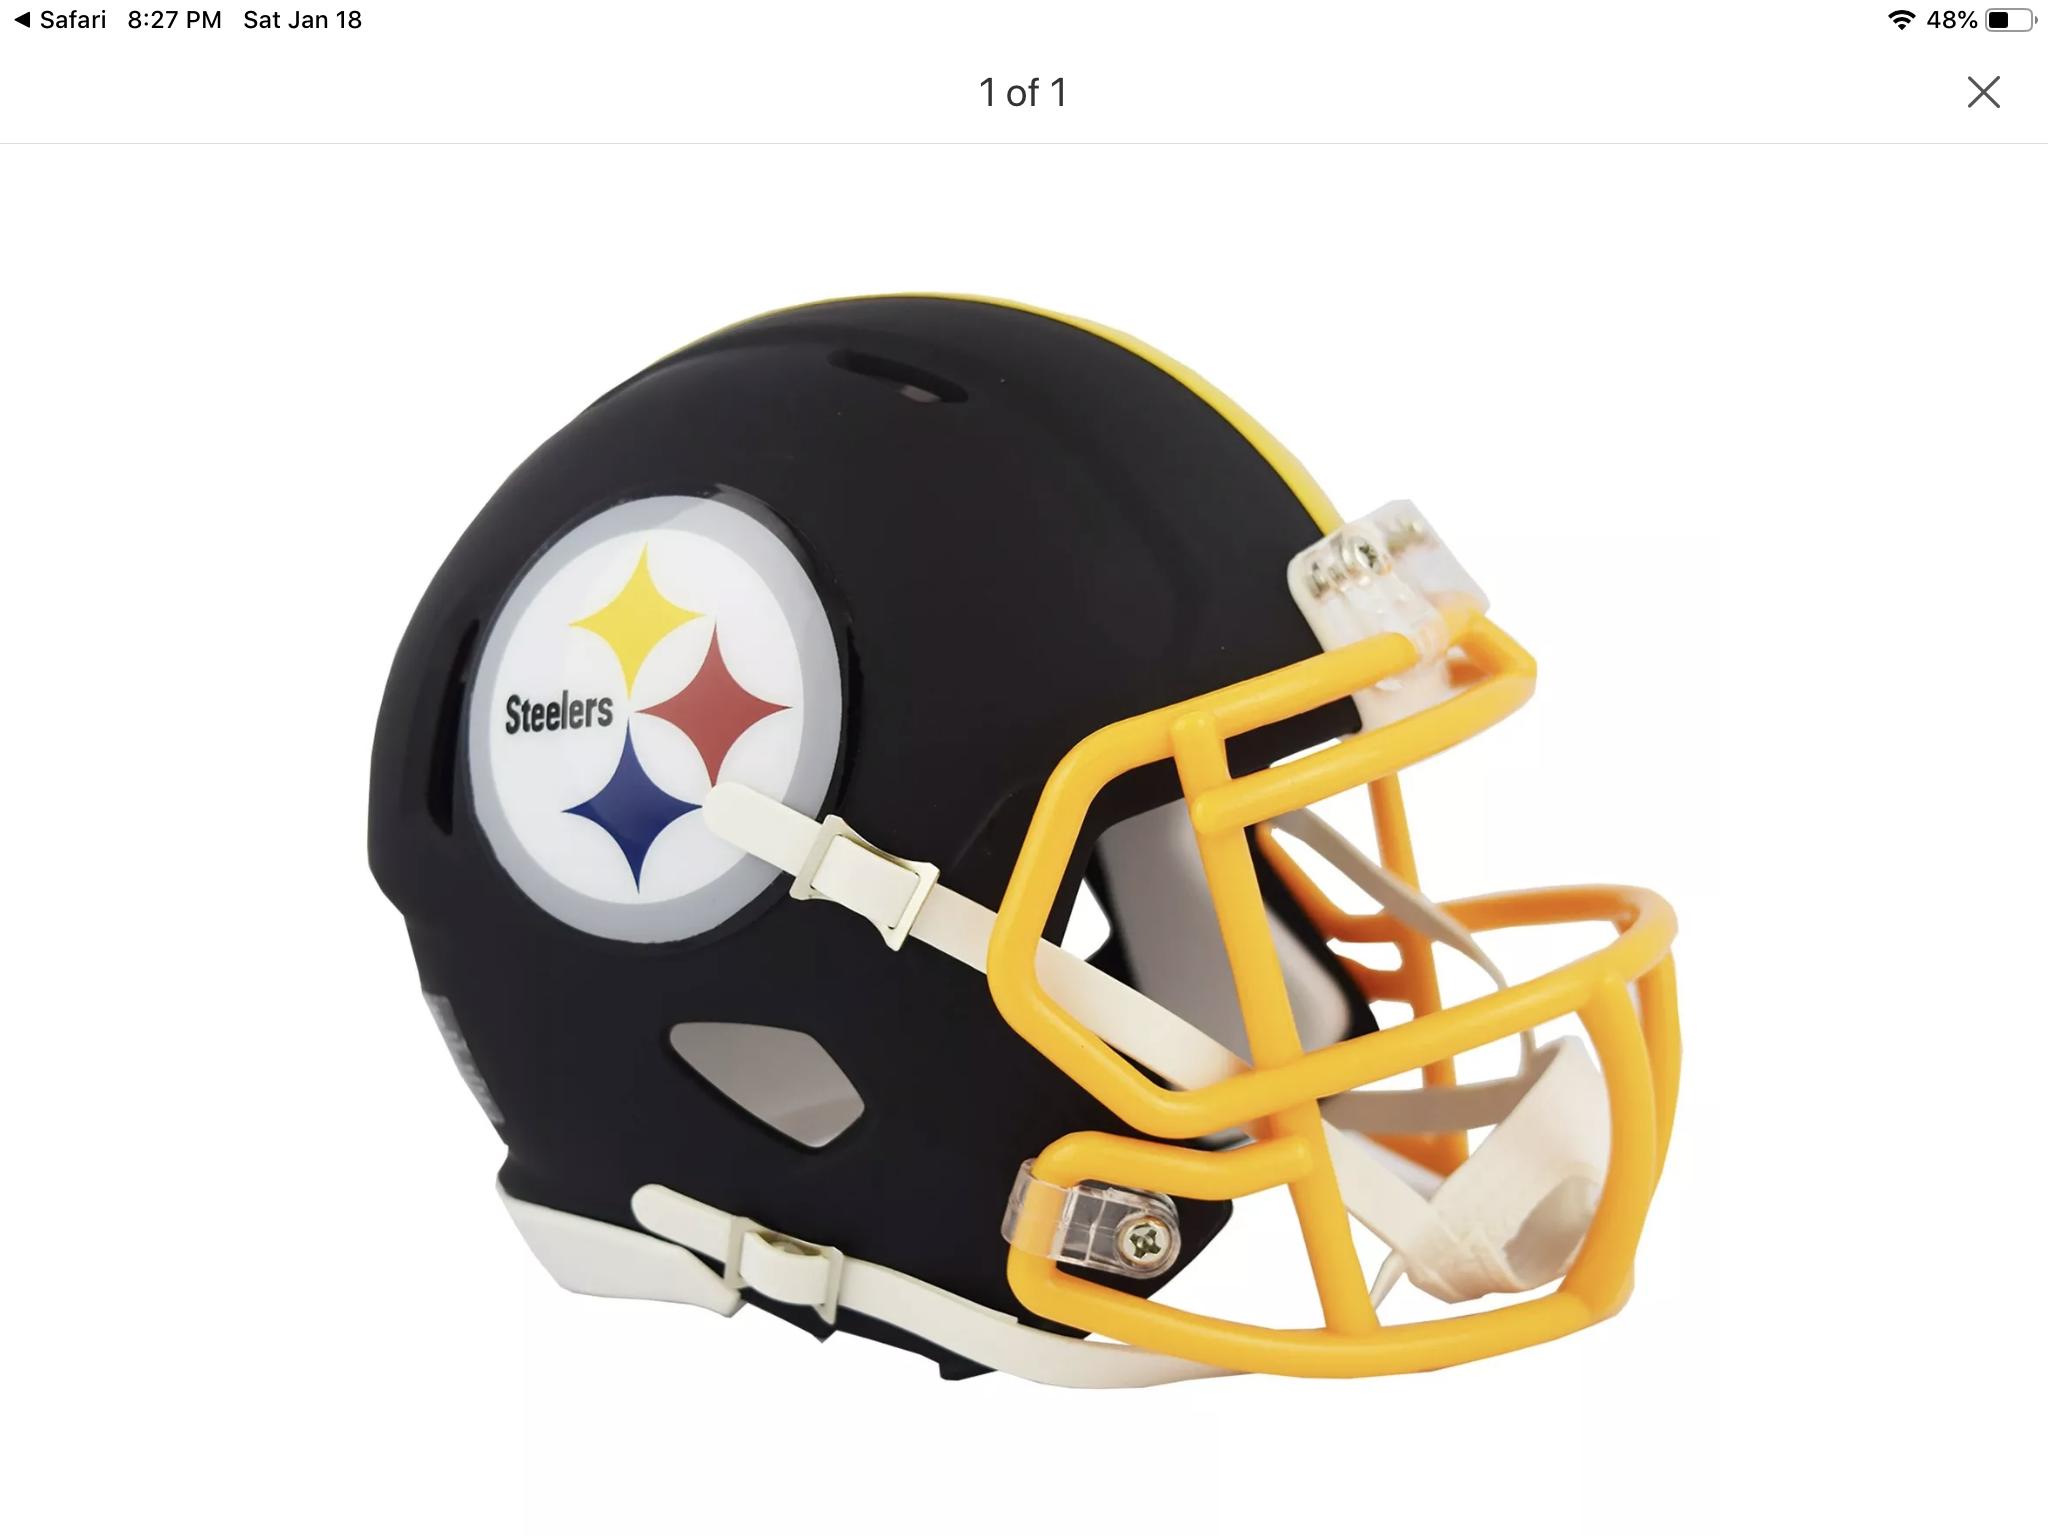 Steelers Black Matte Football Helmets Helmet Steelers